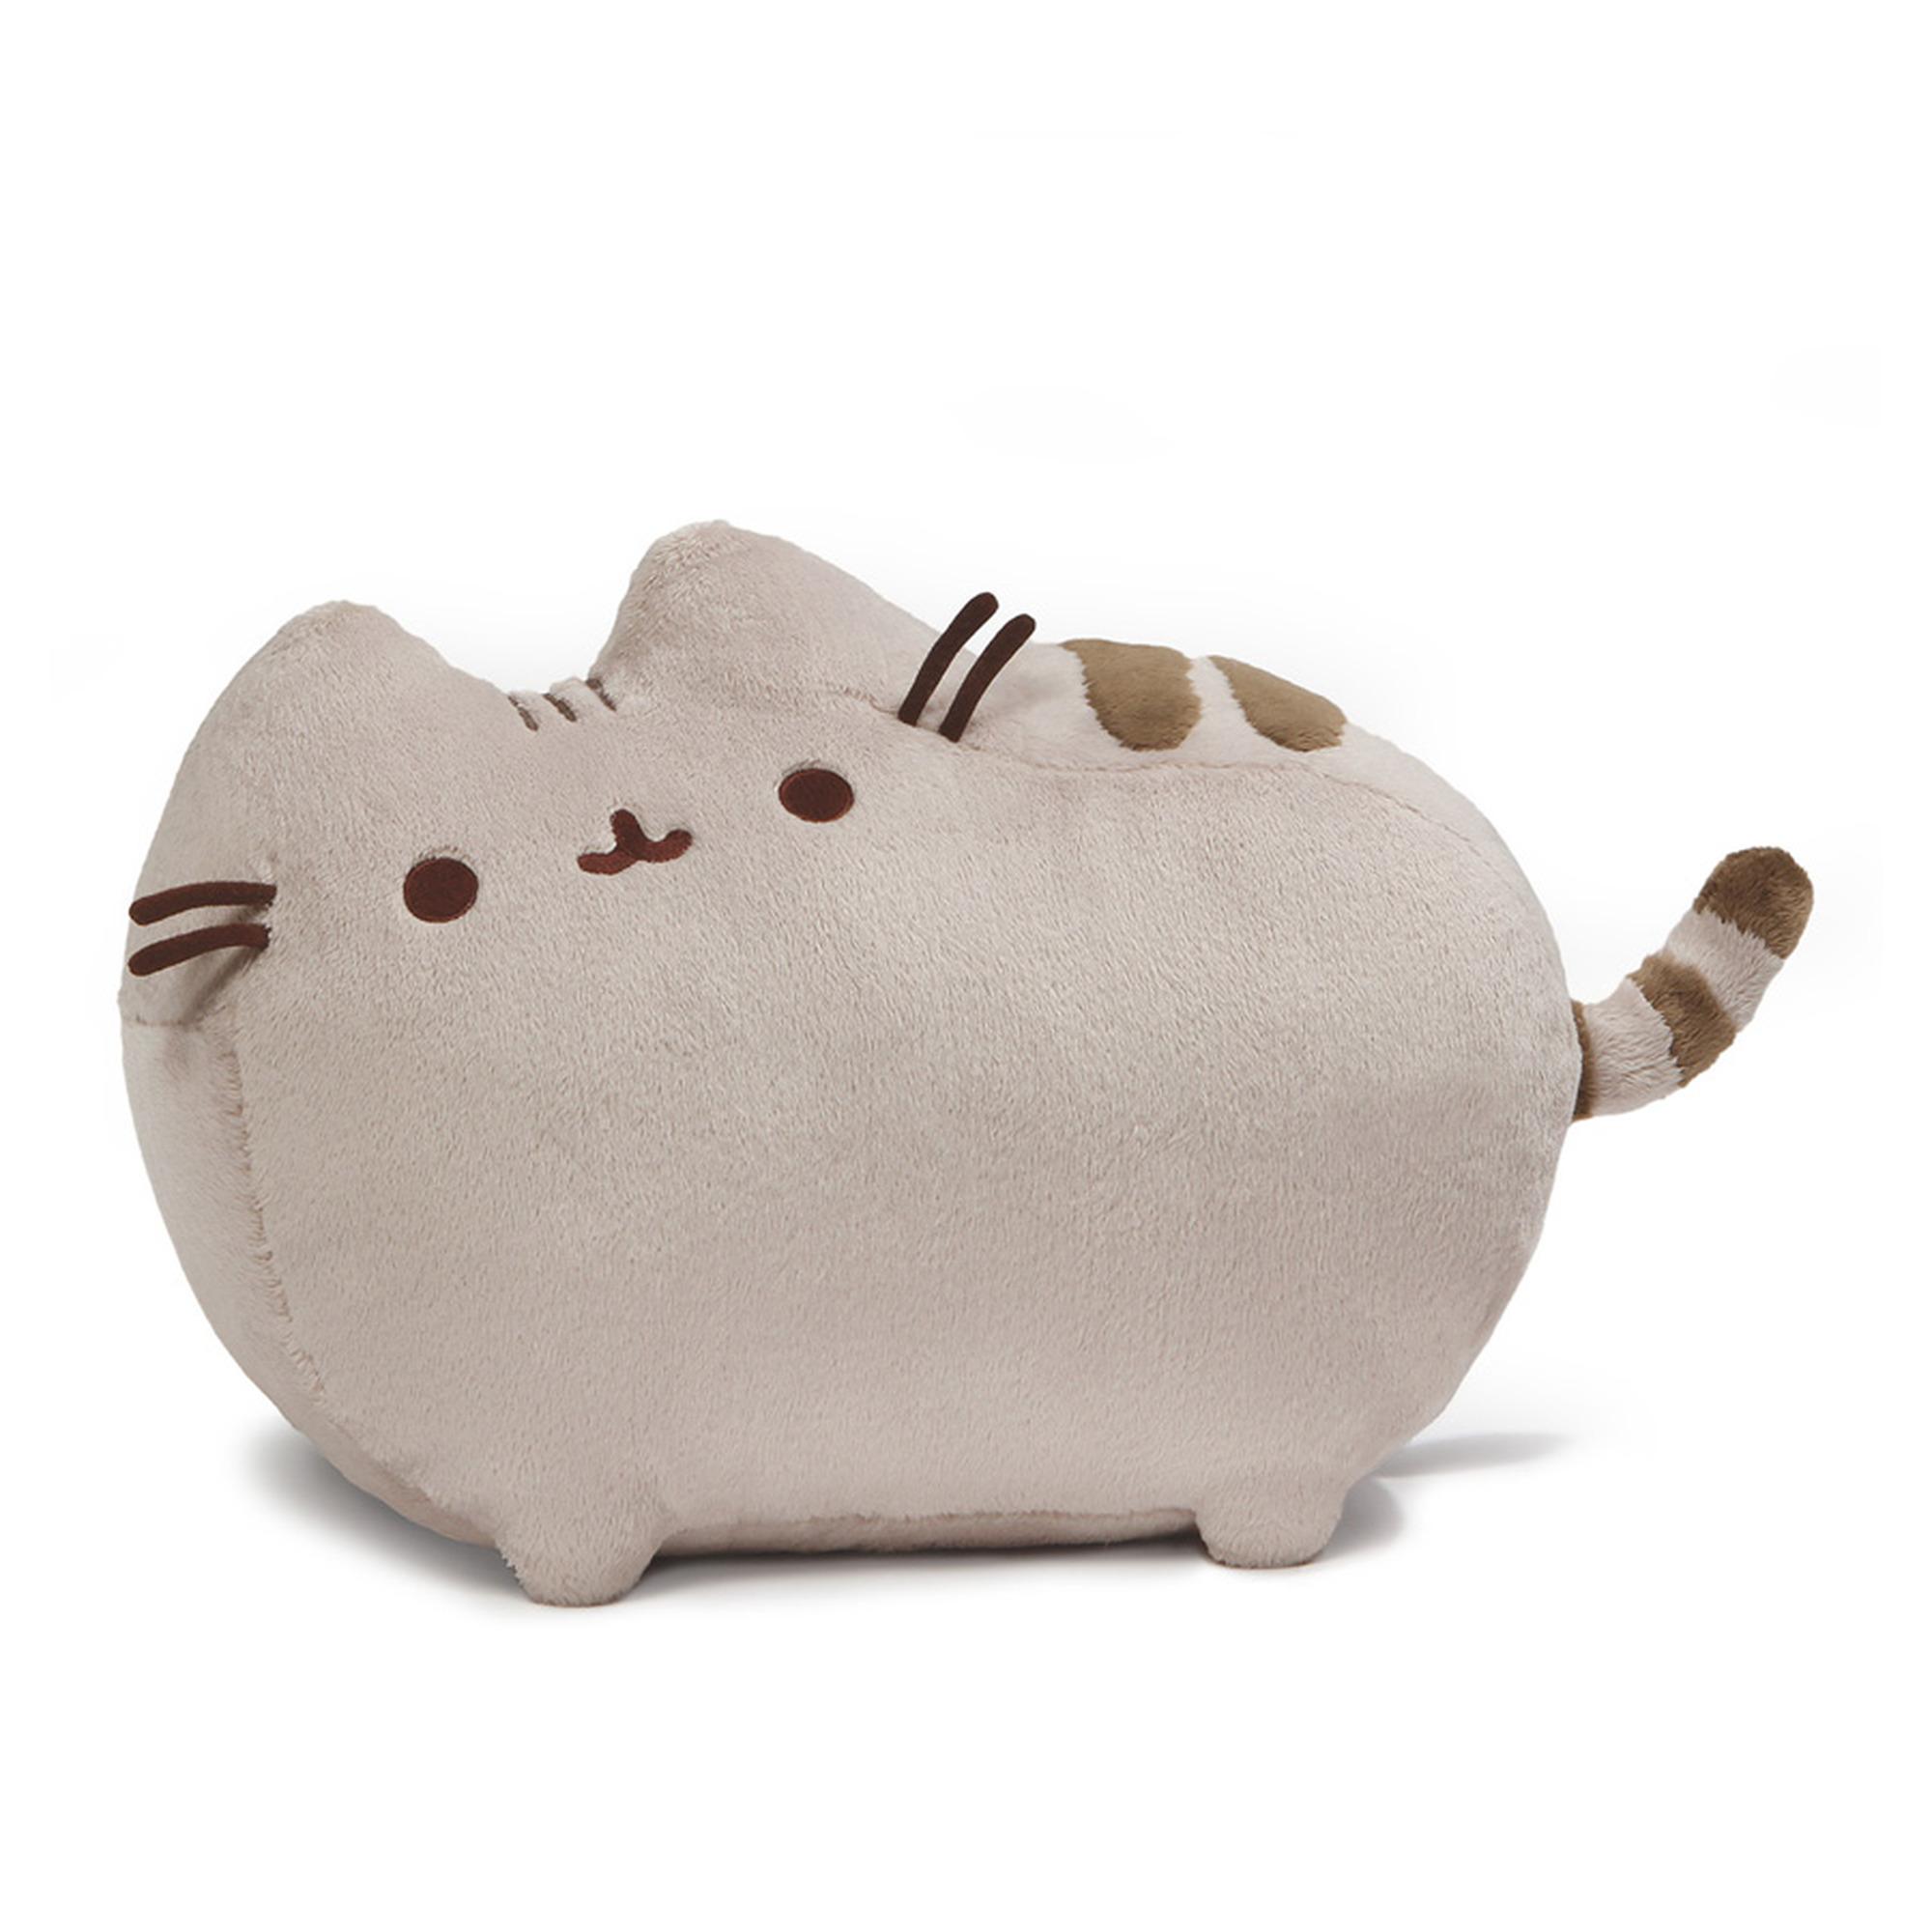 Pusheen Plush Toy Cat Baby Gift